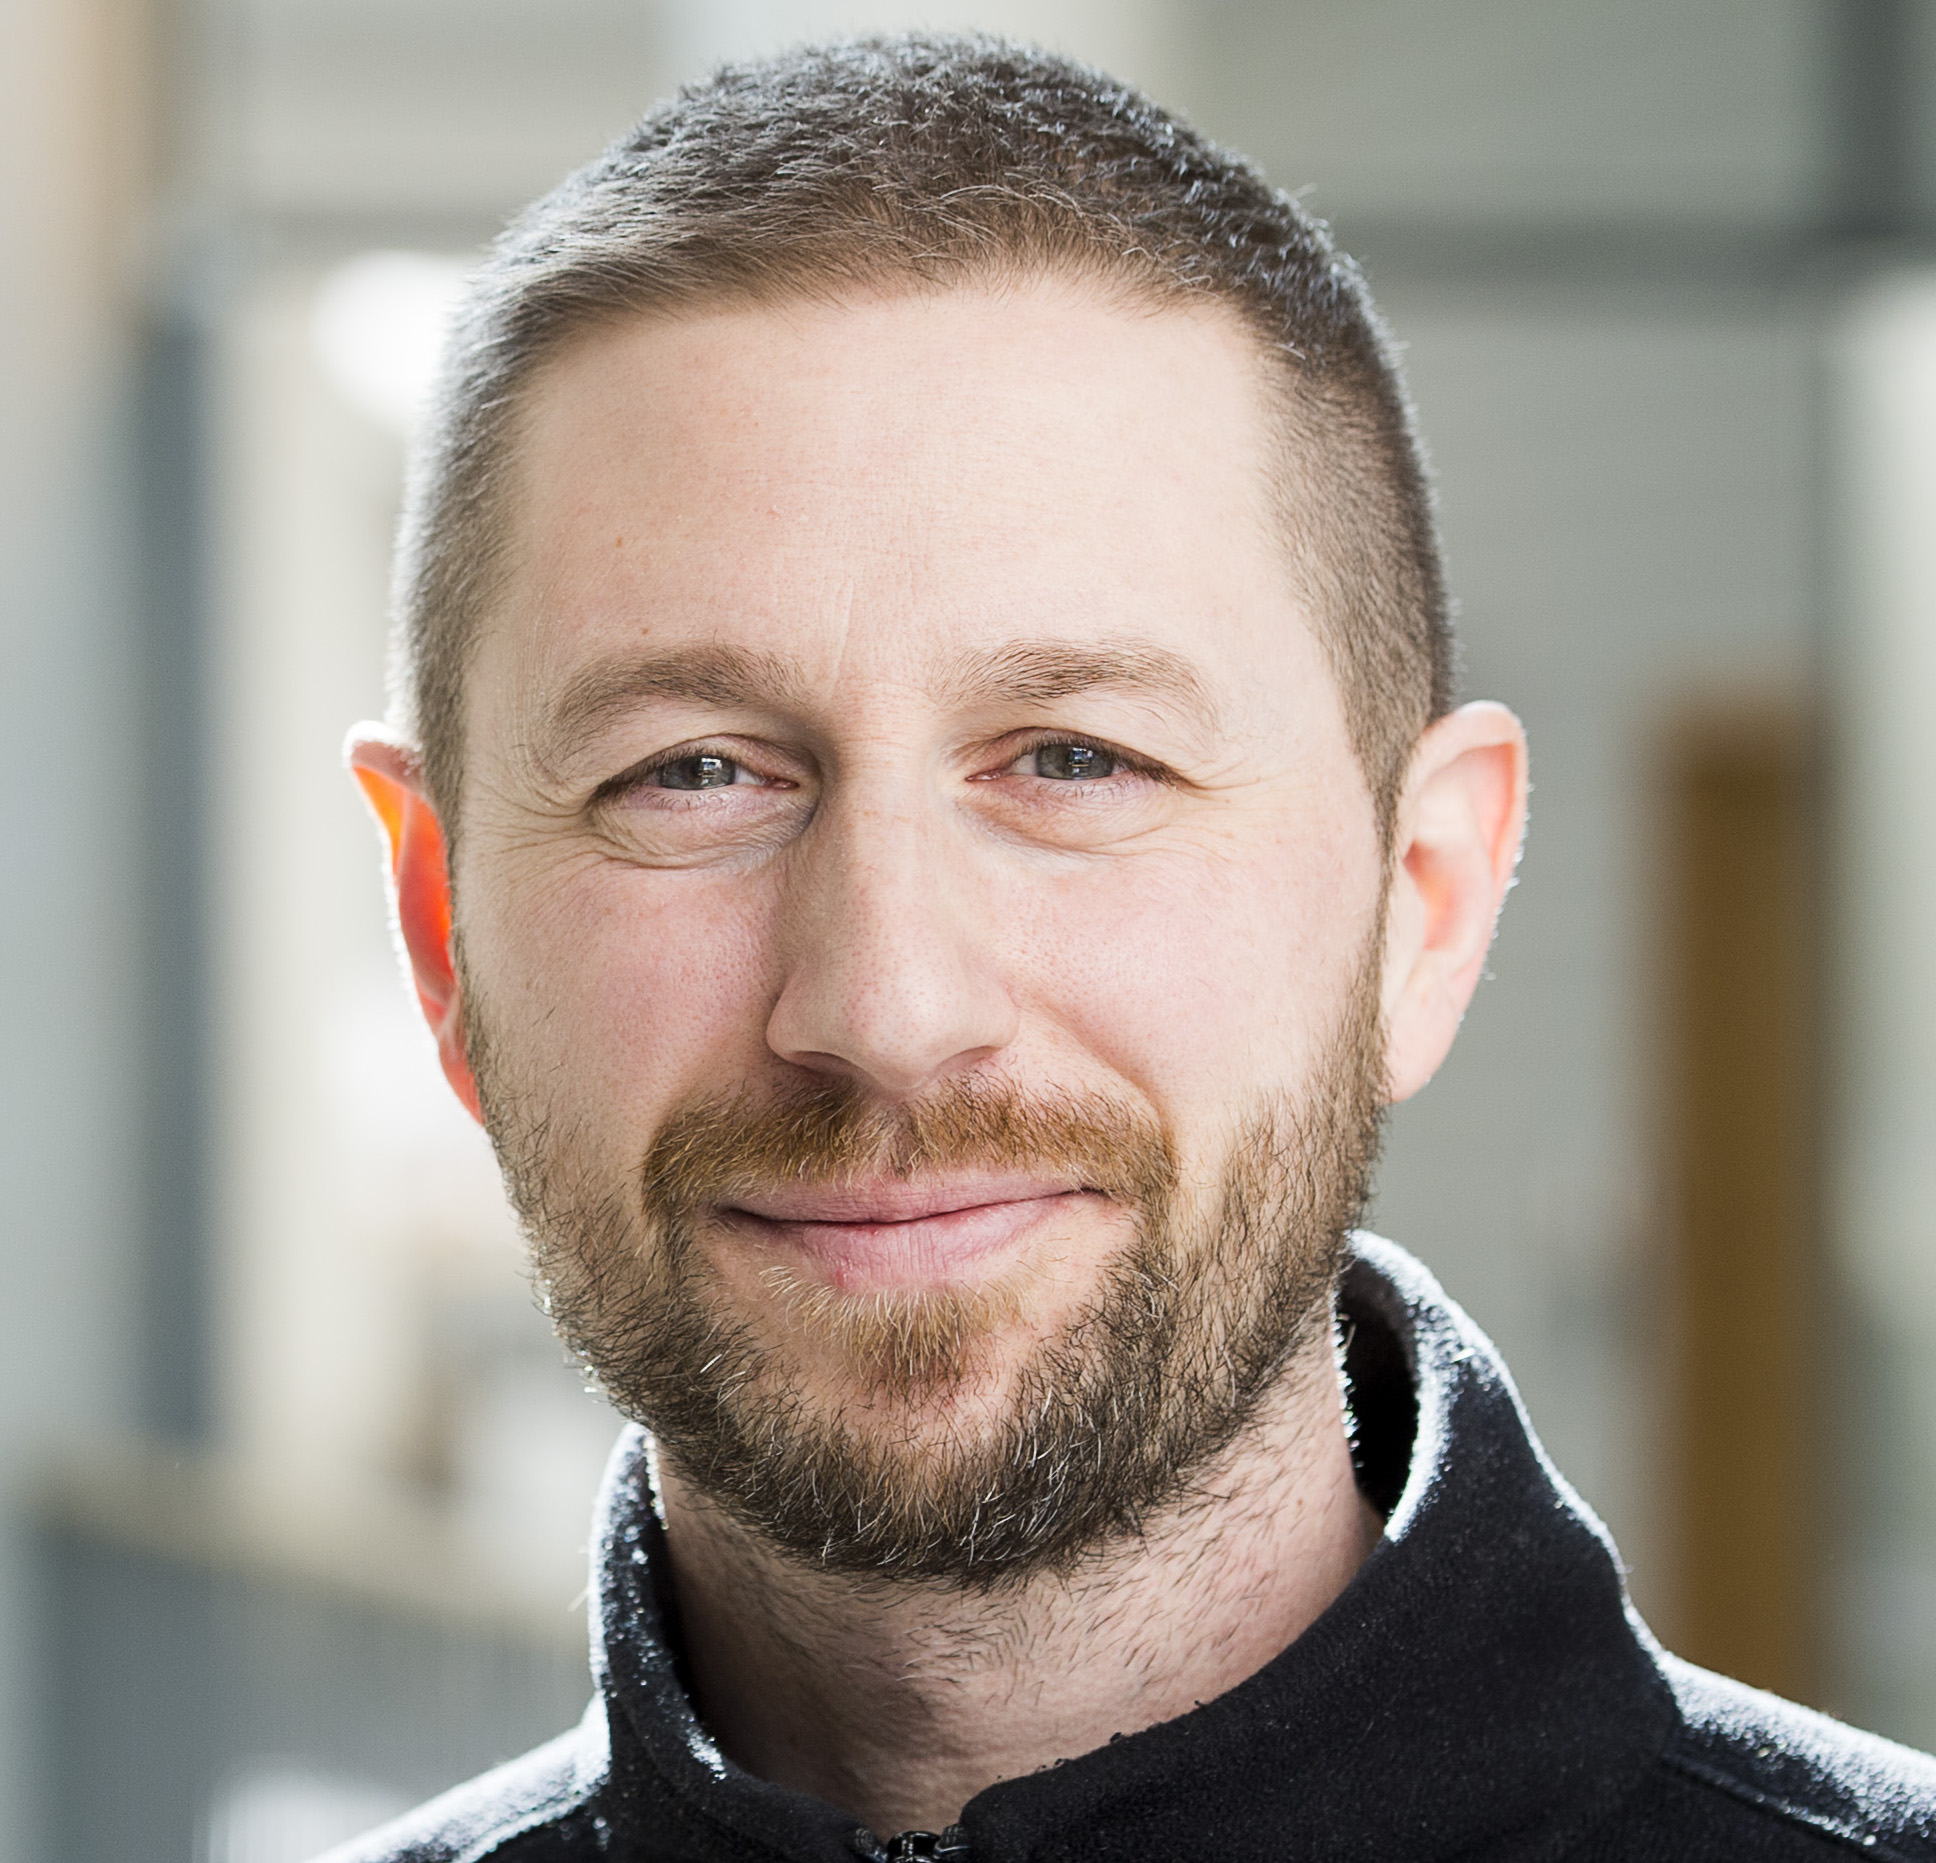 Daniel Brehmer